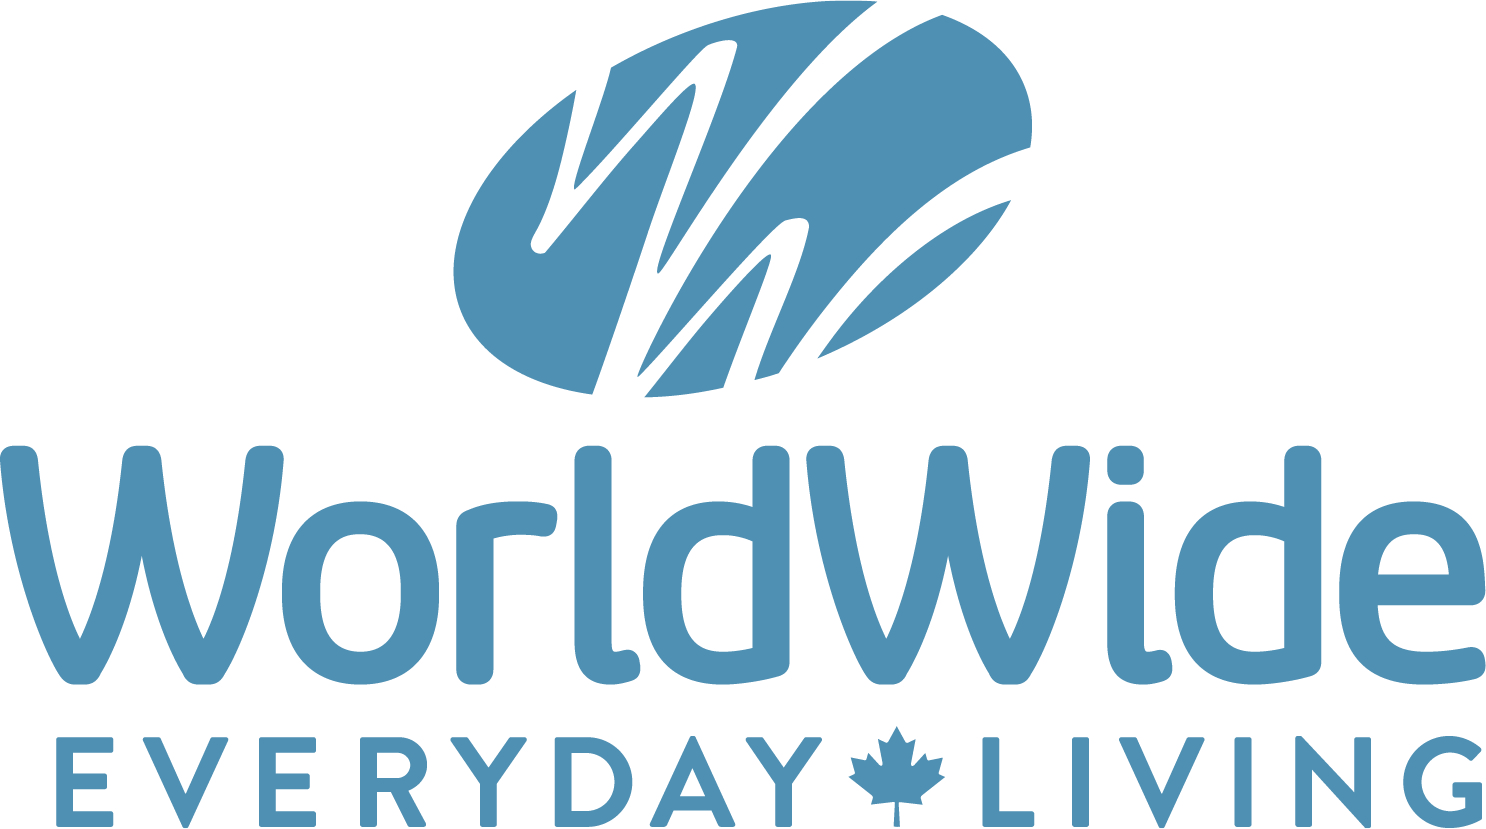 WorldWide Logo 2016 vertical EL blue.jpg